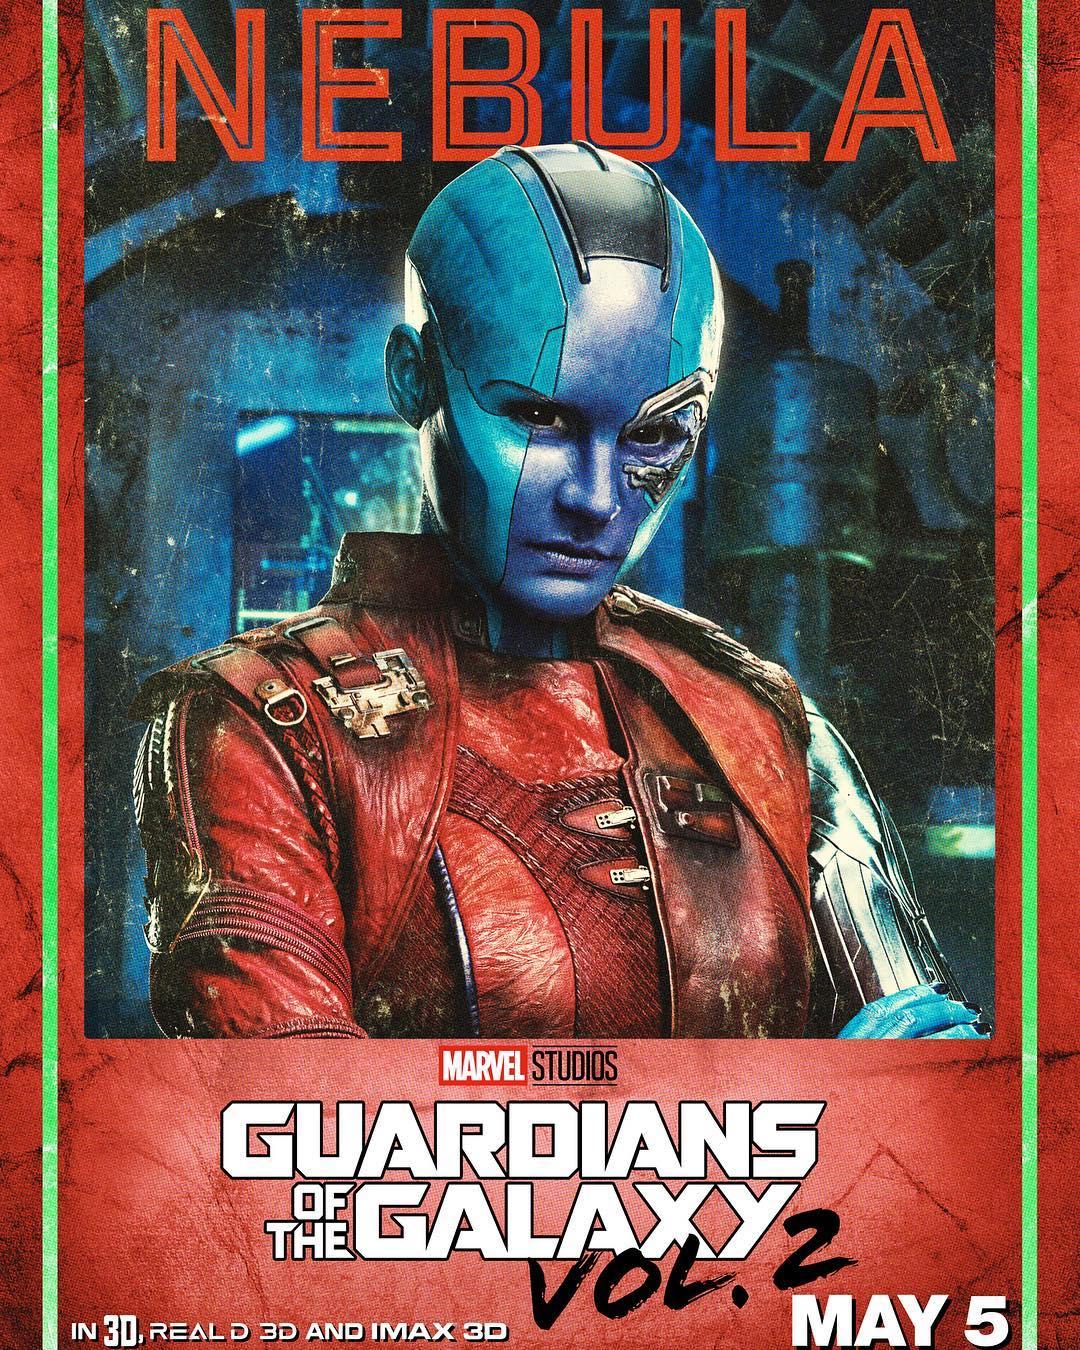 szmk_guardians_galaxy_galaxis_orzoi_karakter_plakat_9_1.jpg